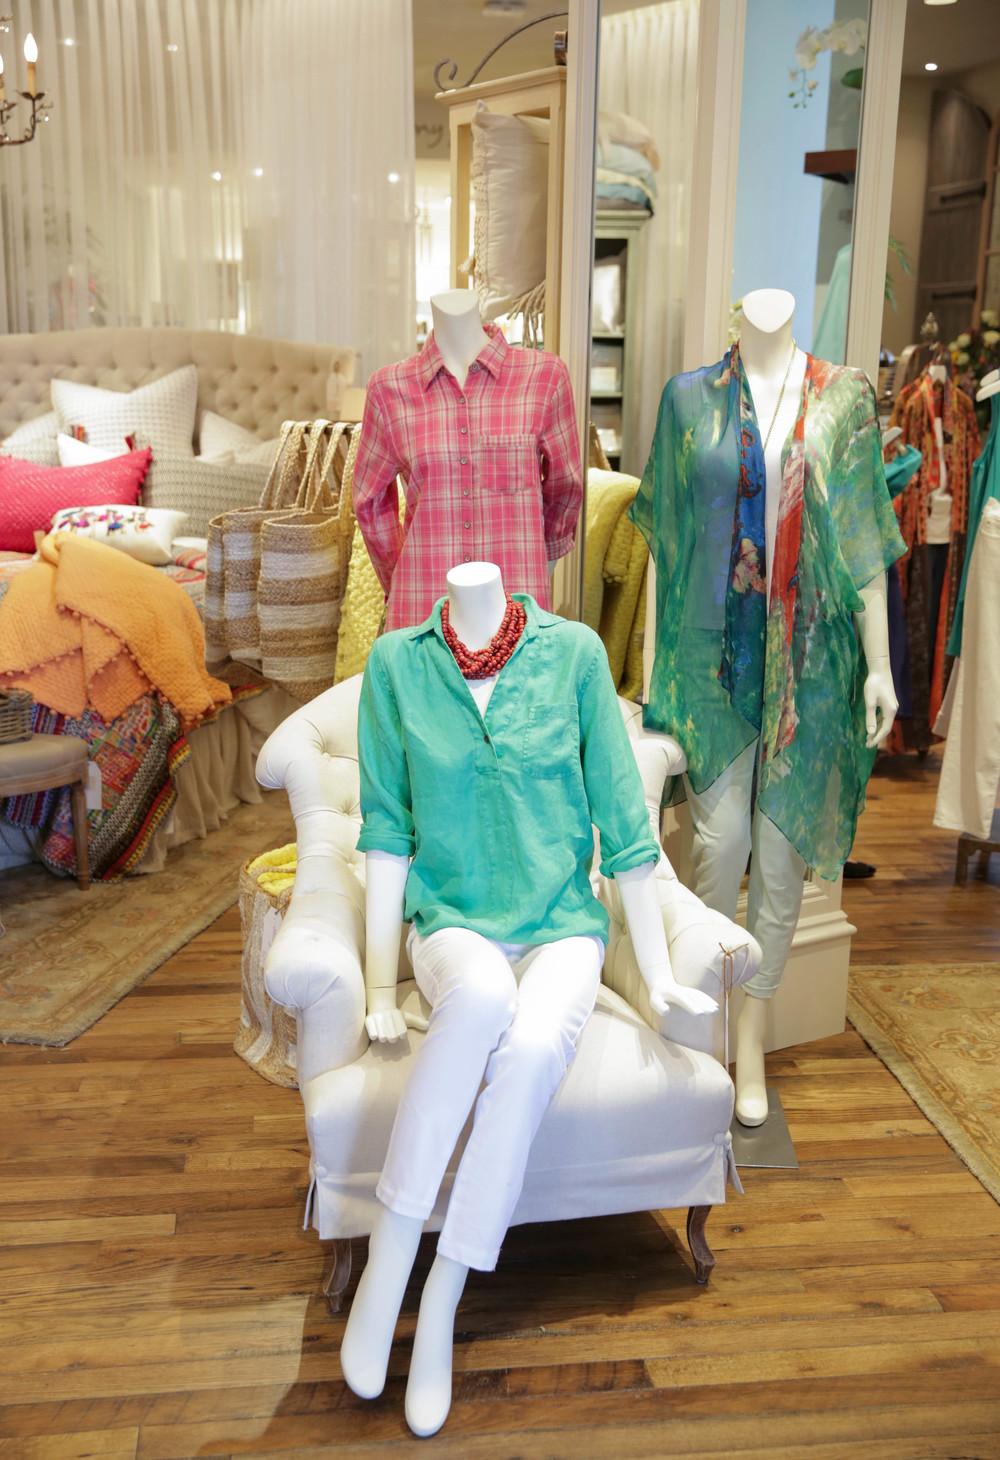 LaurenSchwaiger-Life-Style-Blog-Soft-Surroundings-Grand-Opening-Blakeney-Charlotte.jpg